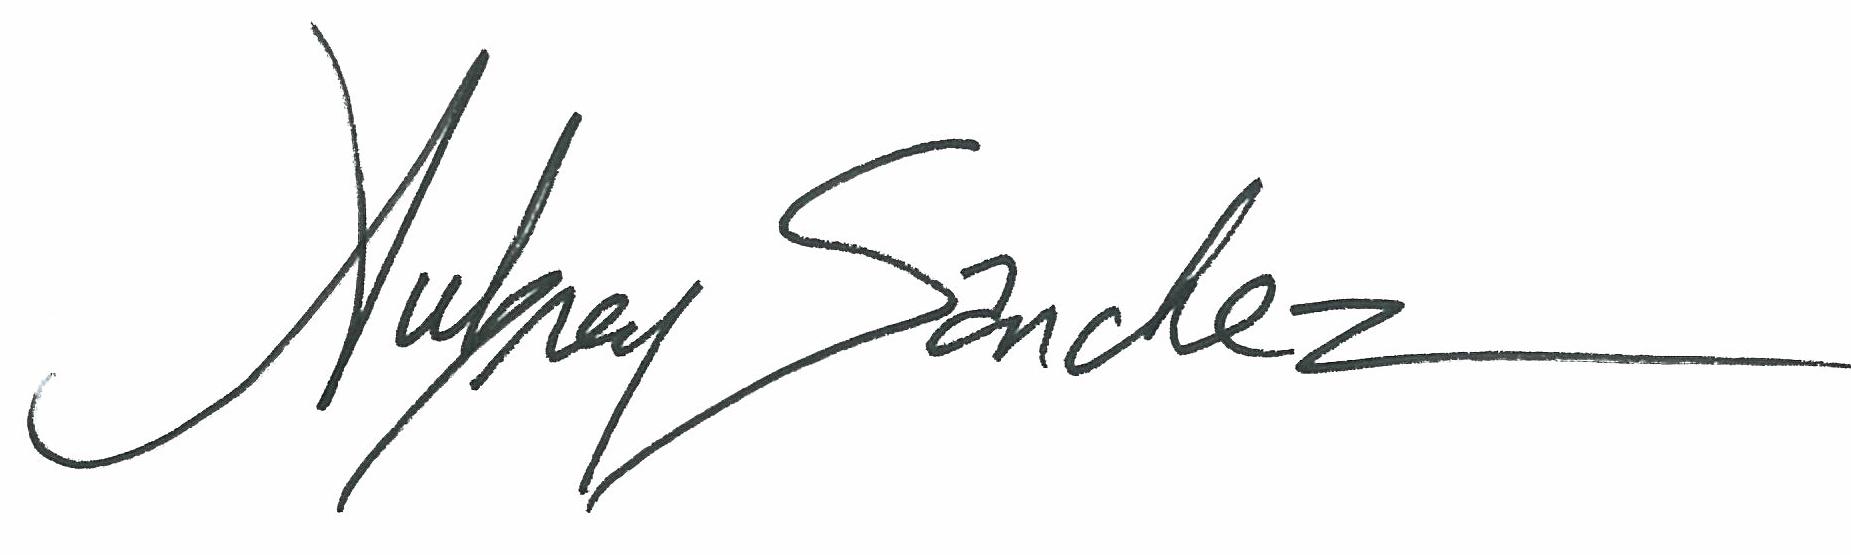 Aubrey Sanchez Signature